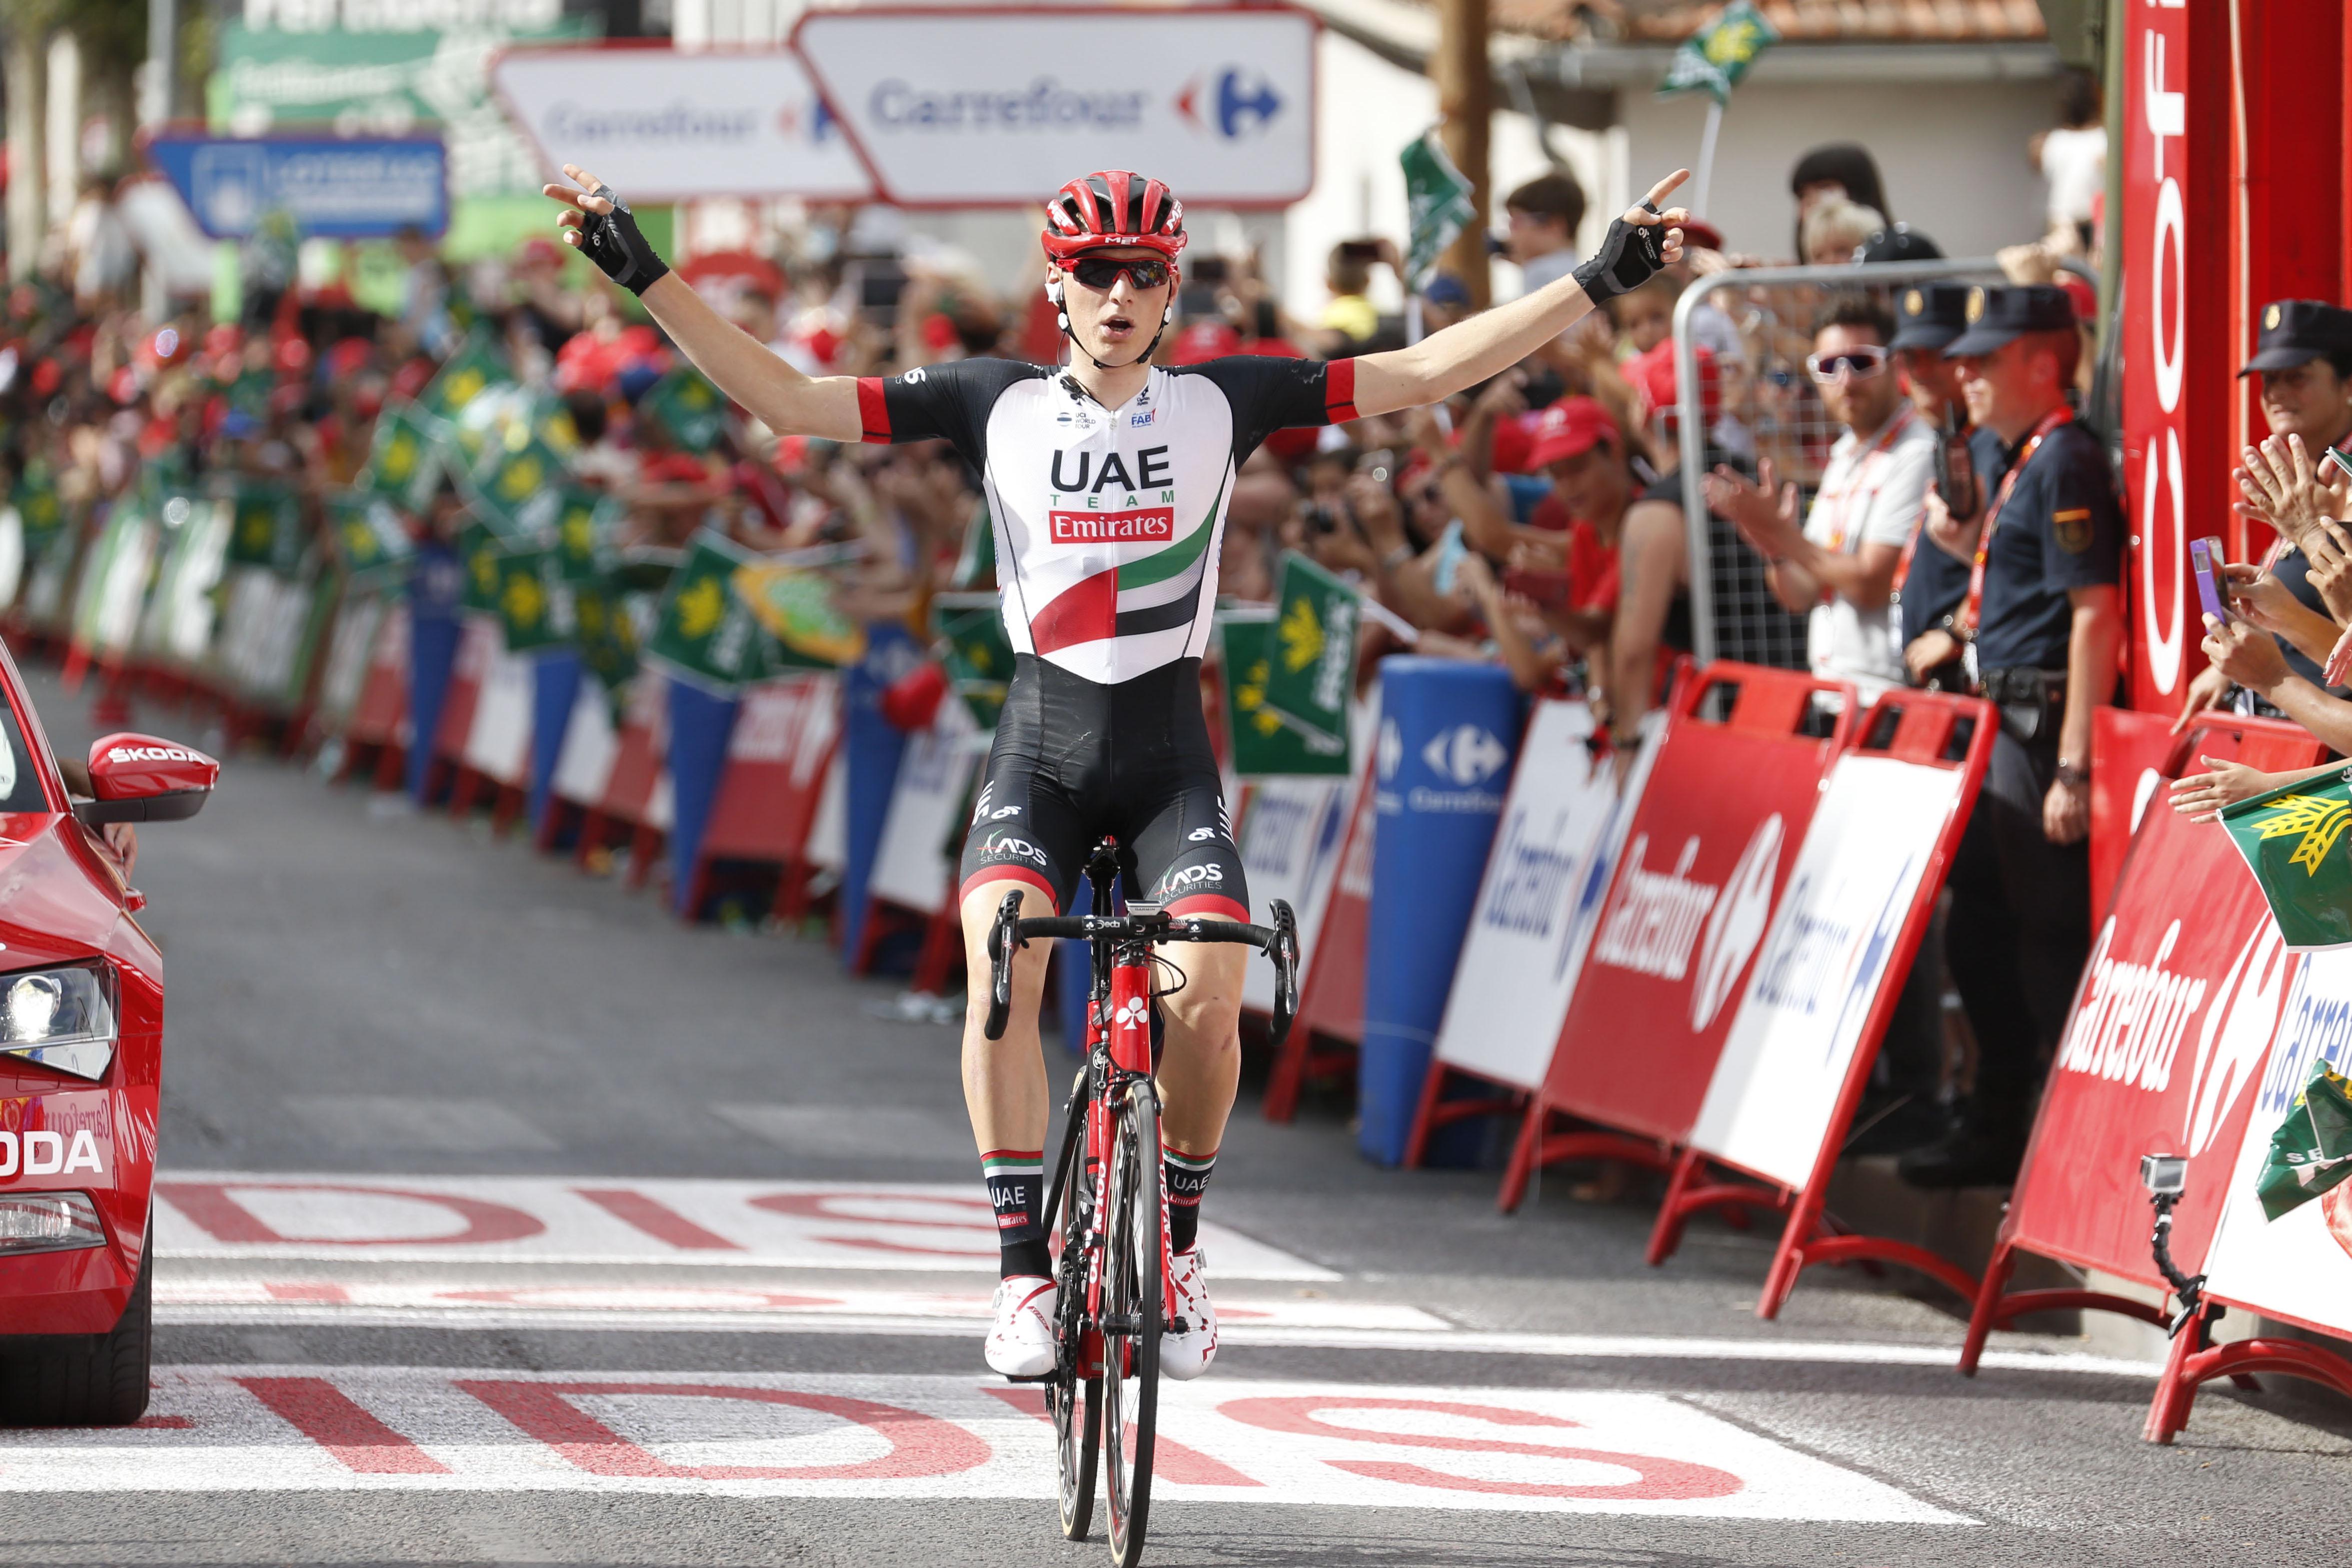 Maciej Mohoric took a stage victory at the Vuelta a España for UAE Photo    Yuzuru SUNADA e3272778c